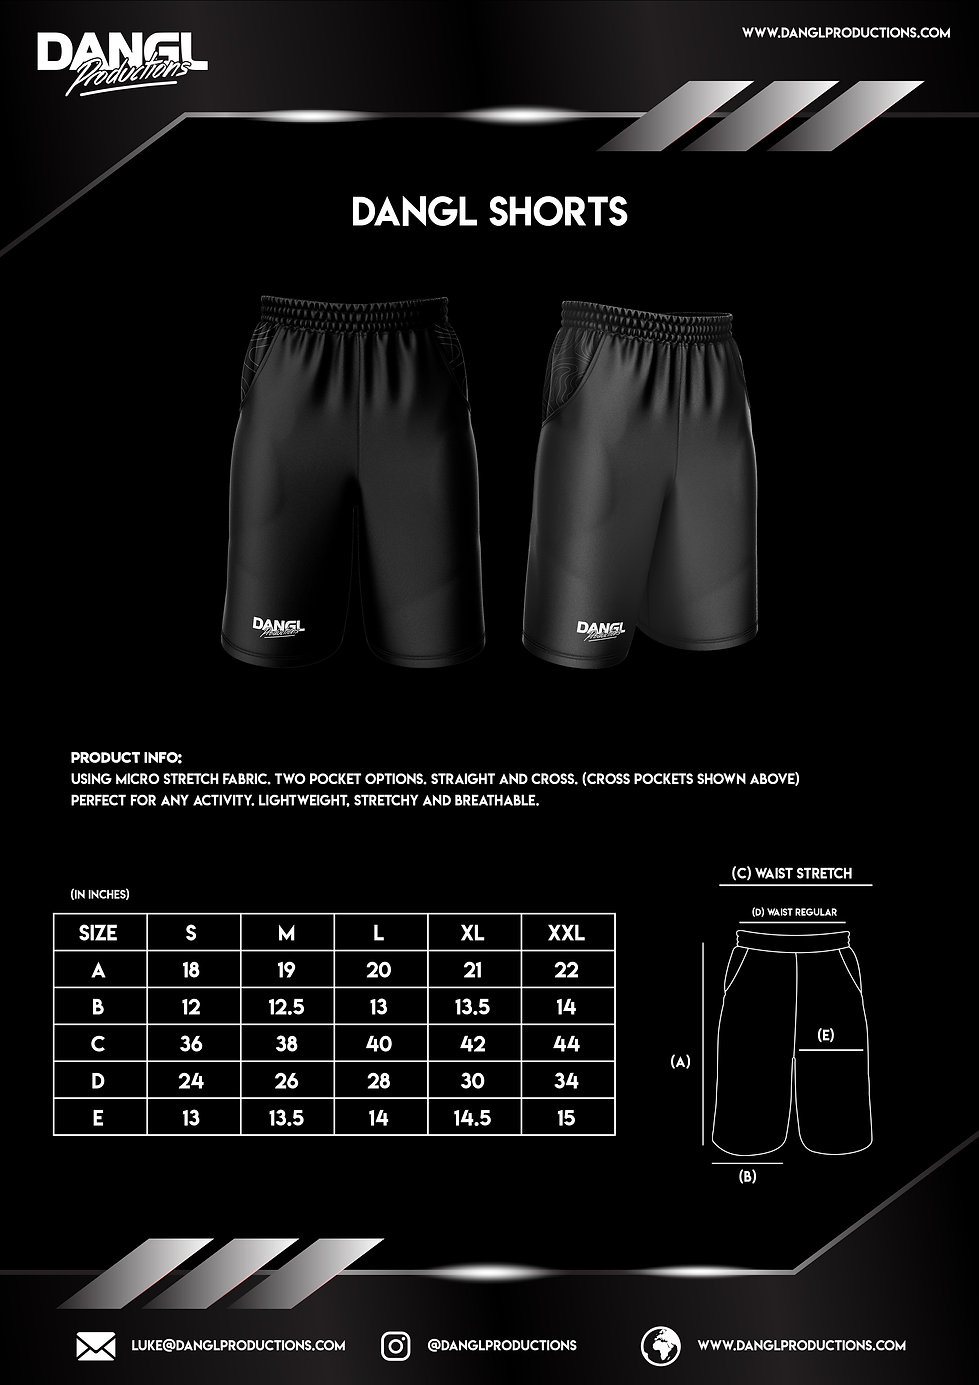 Dangl brochure_0003_dangl shorts brochur